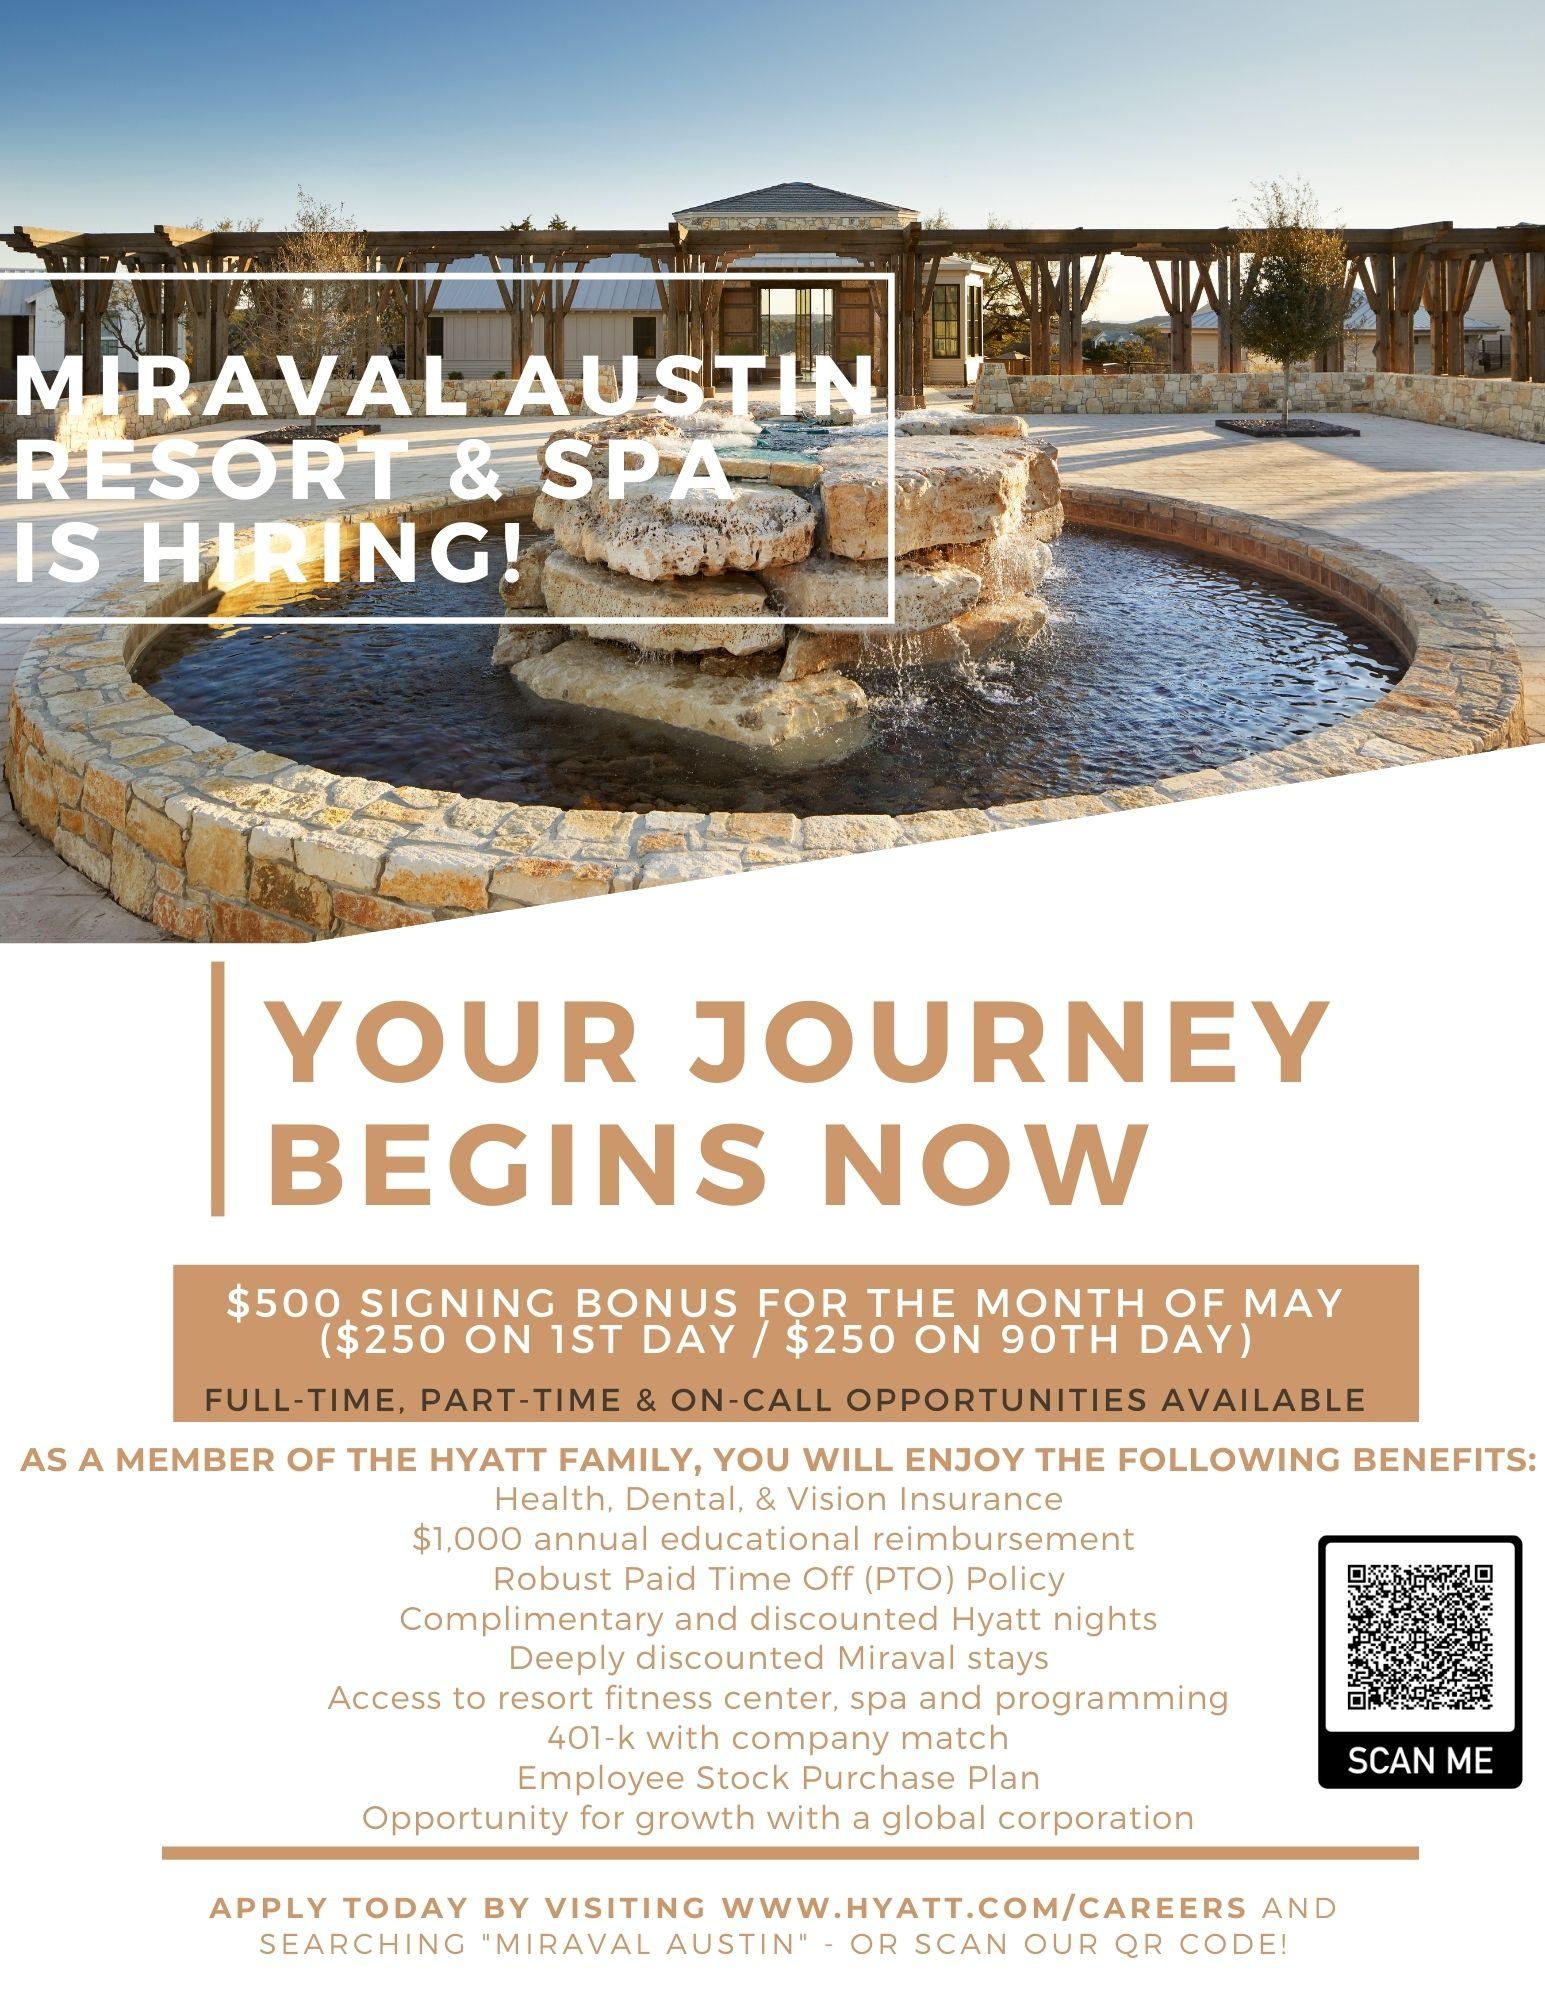 Signing-Bonus Miraval Austin Resort and Spa - May 2021